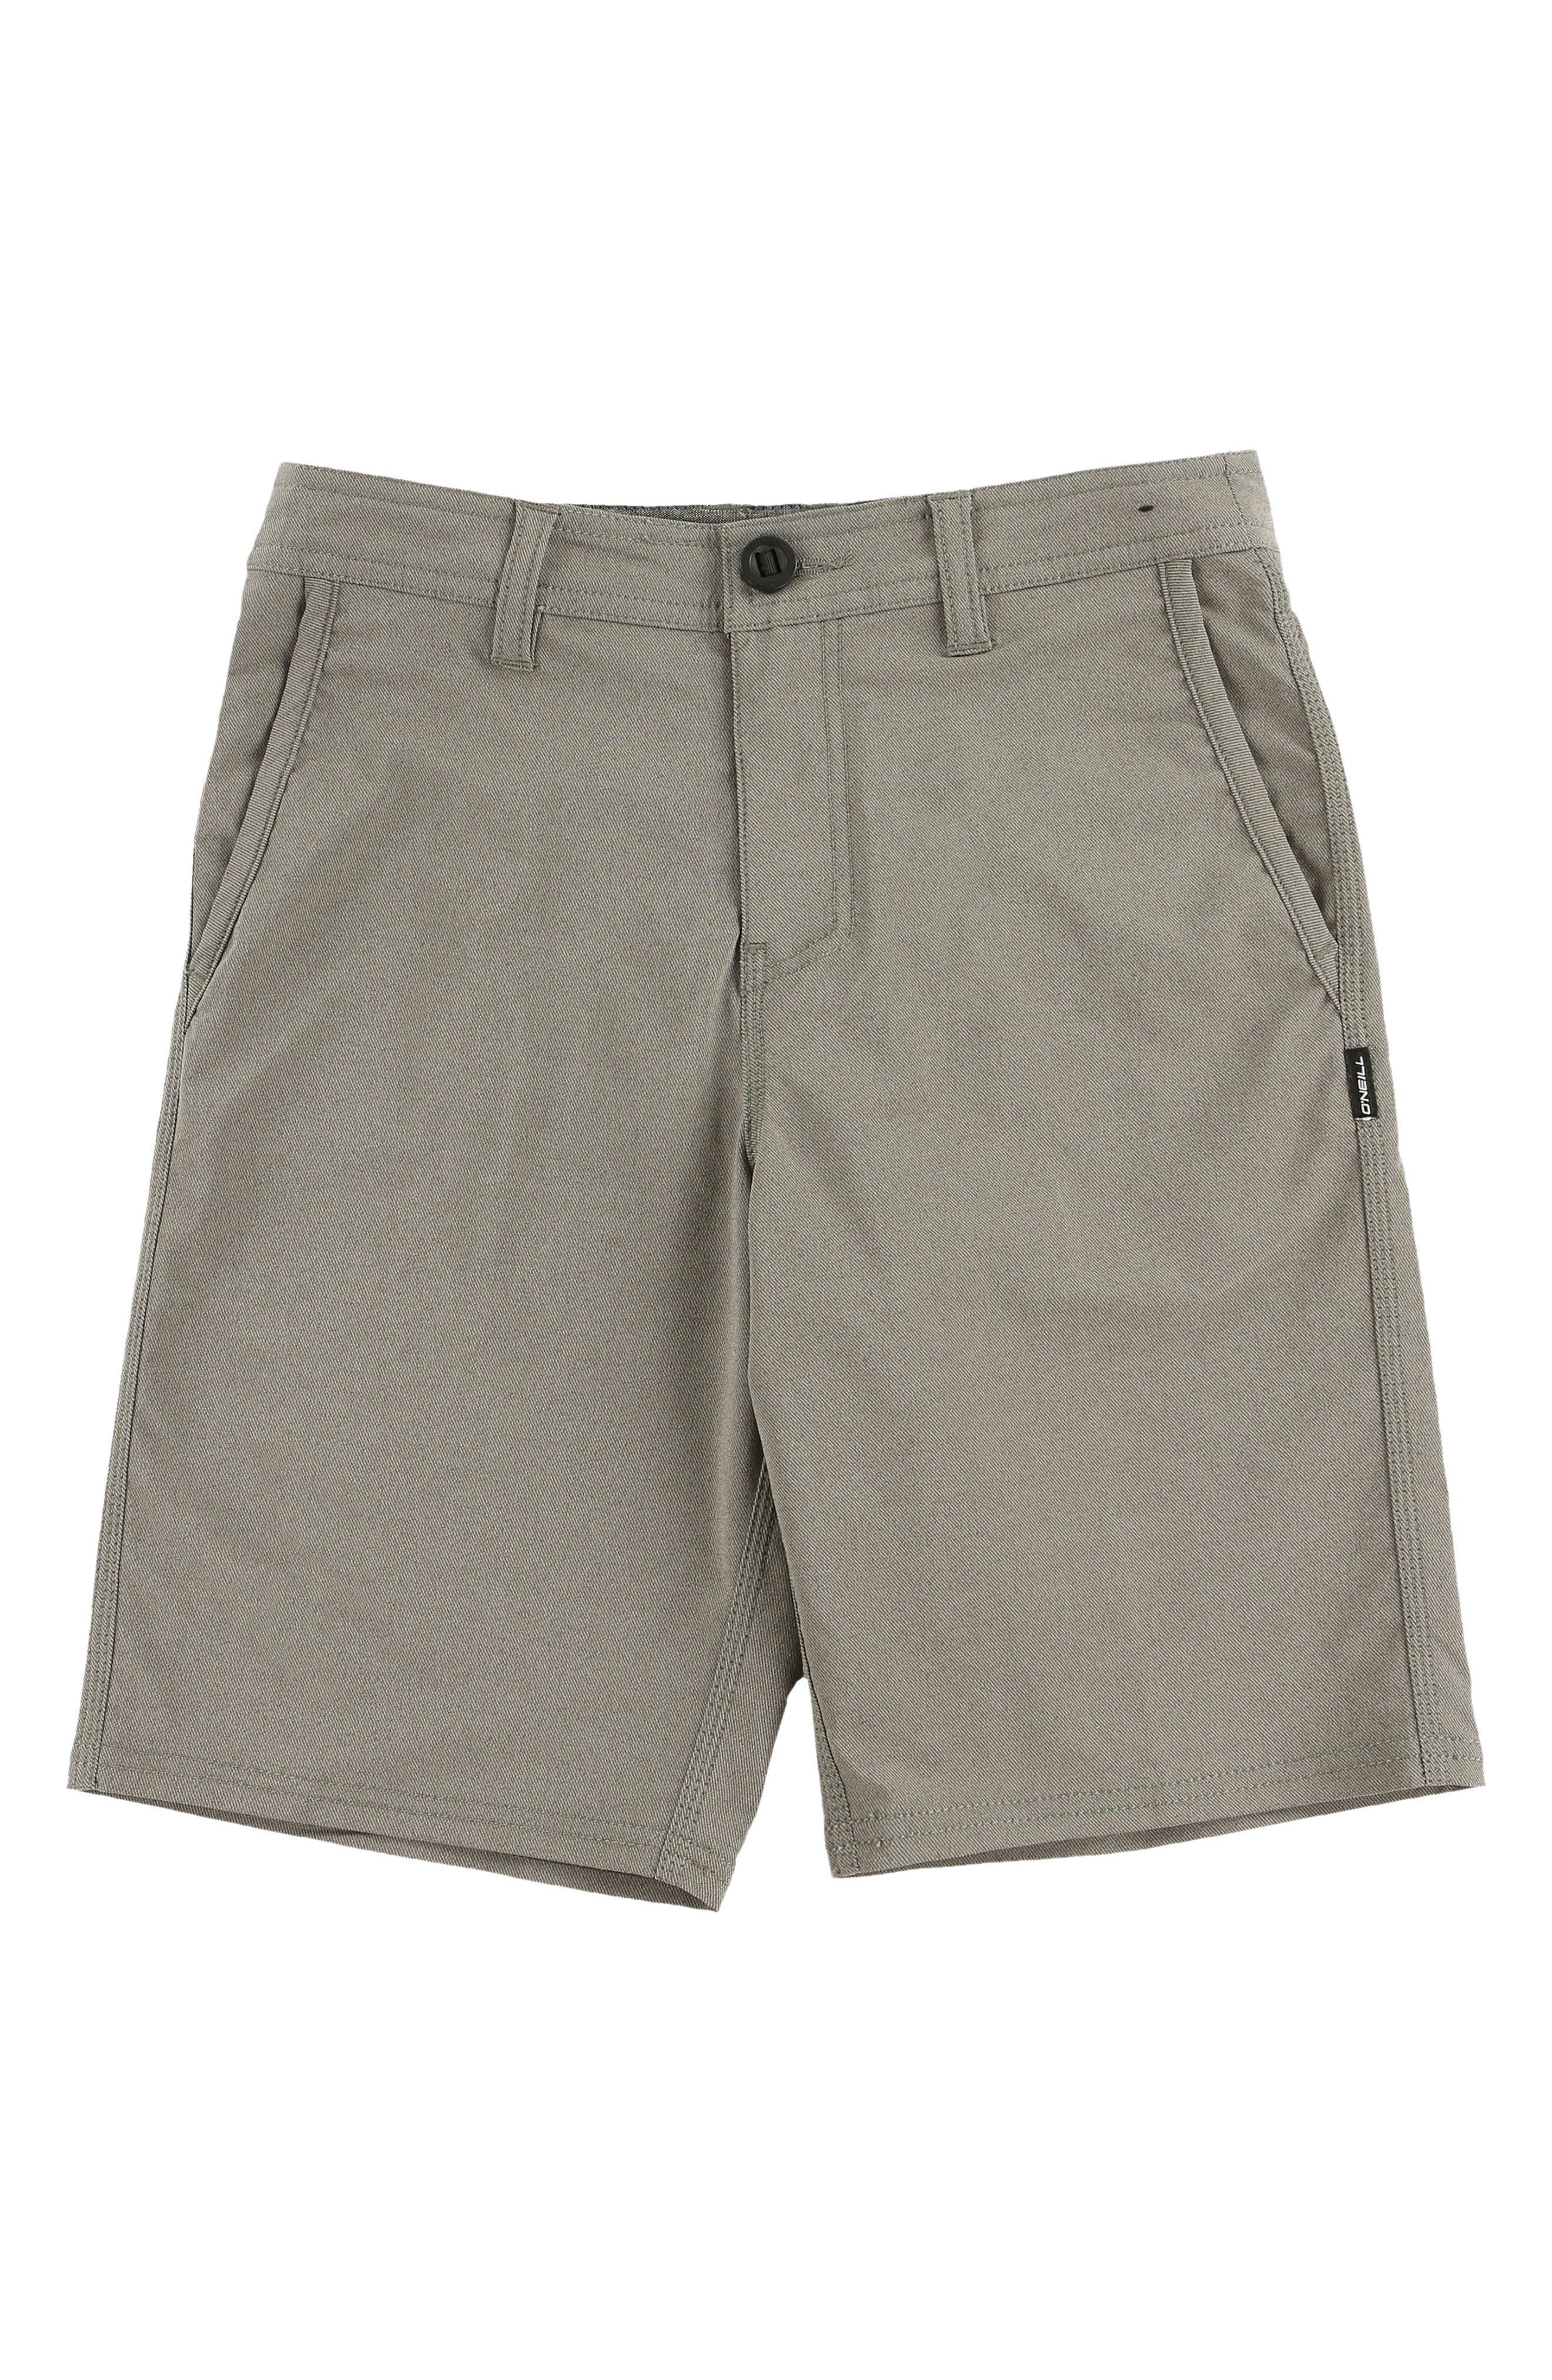 Stockton Hybrid Shorts,                         Main,                         color, COFFEE